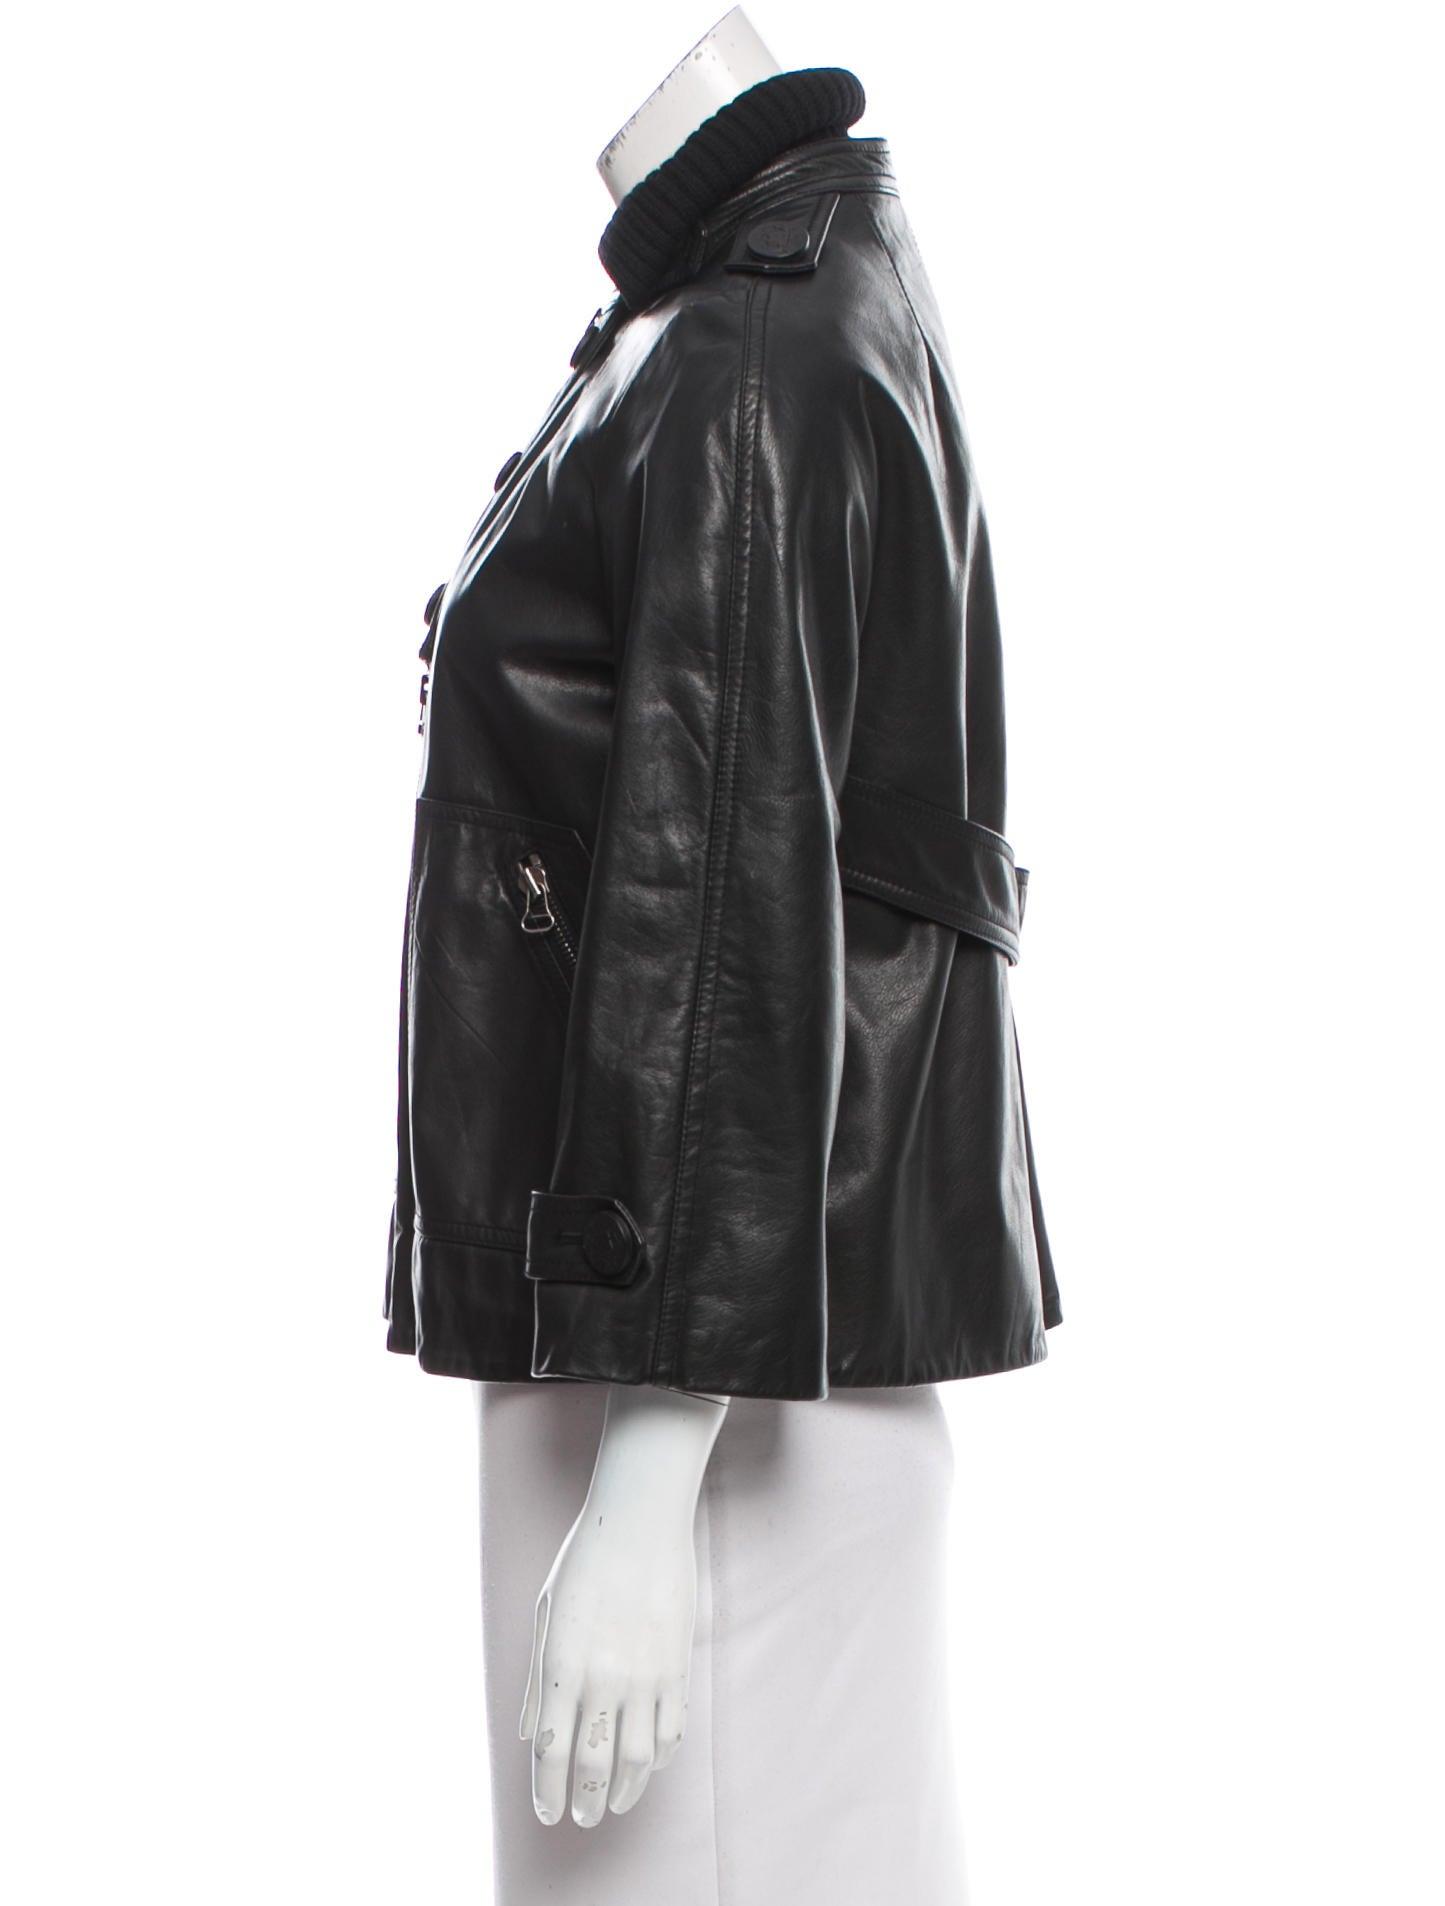 3.1 phillip lim leather jacket